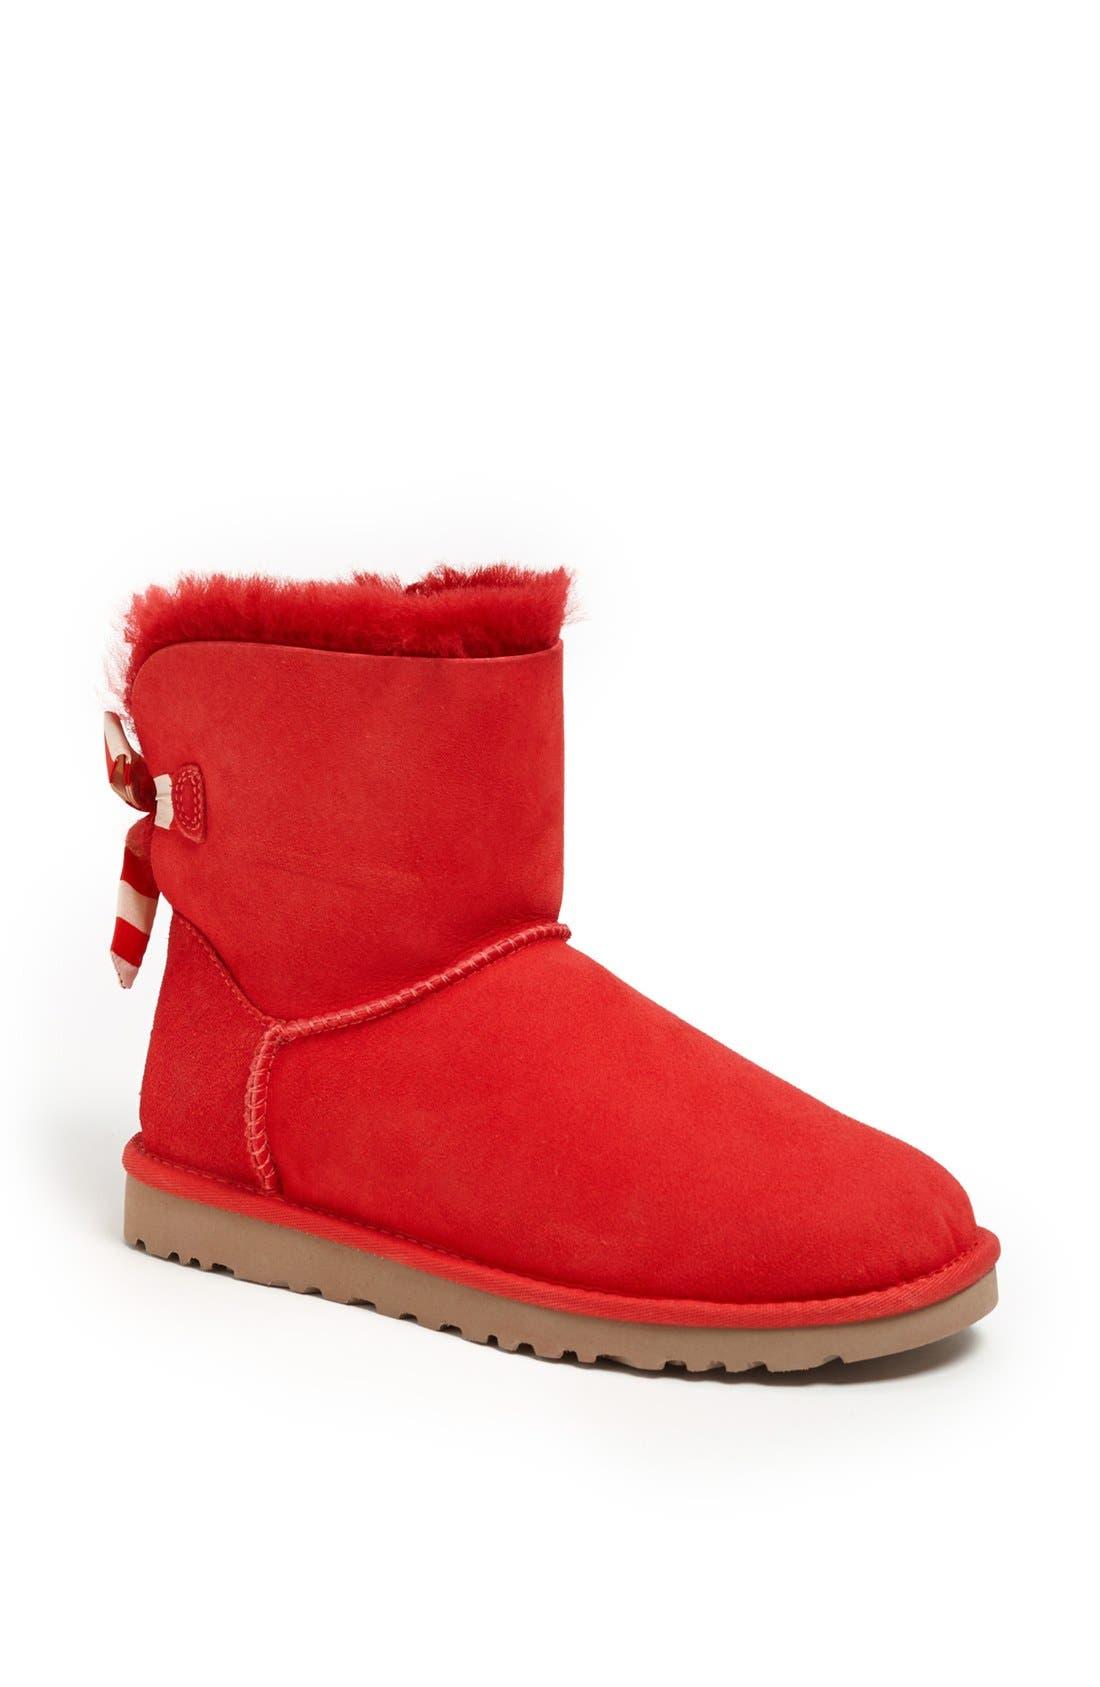 Main Image - UGG® Australia 'Mini Bailey Button Bow' Boot (Women)